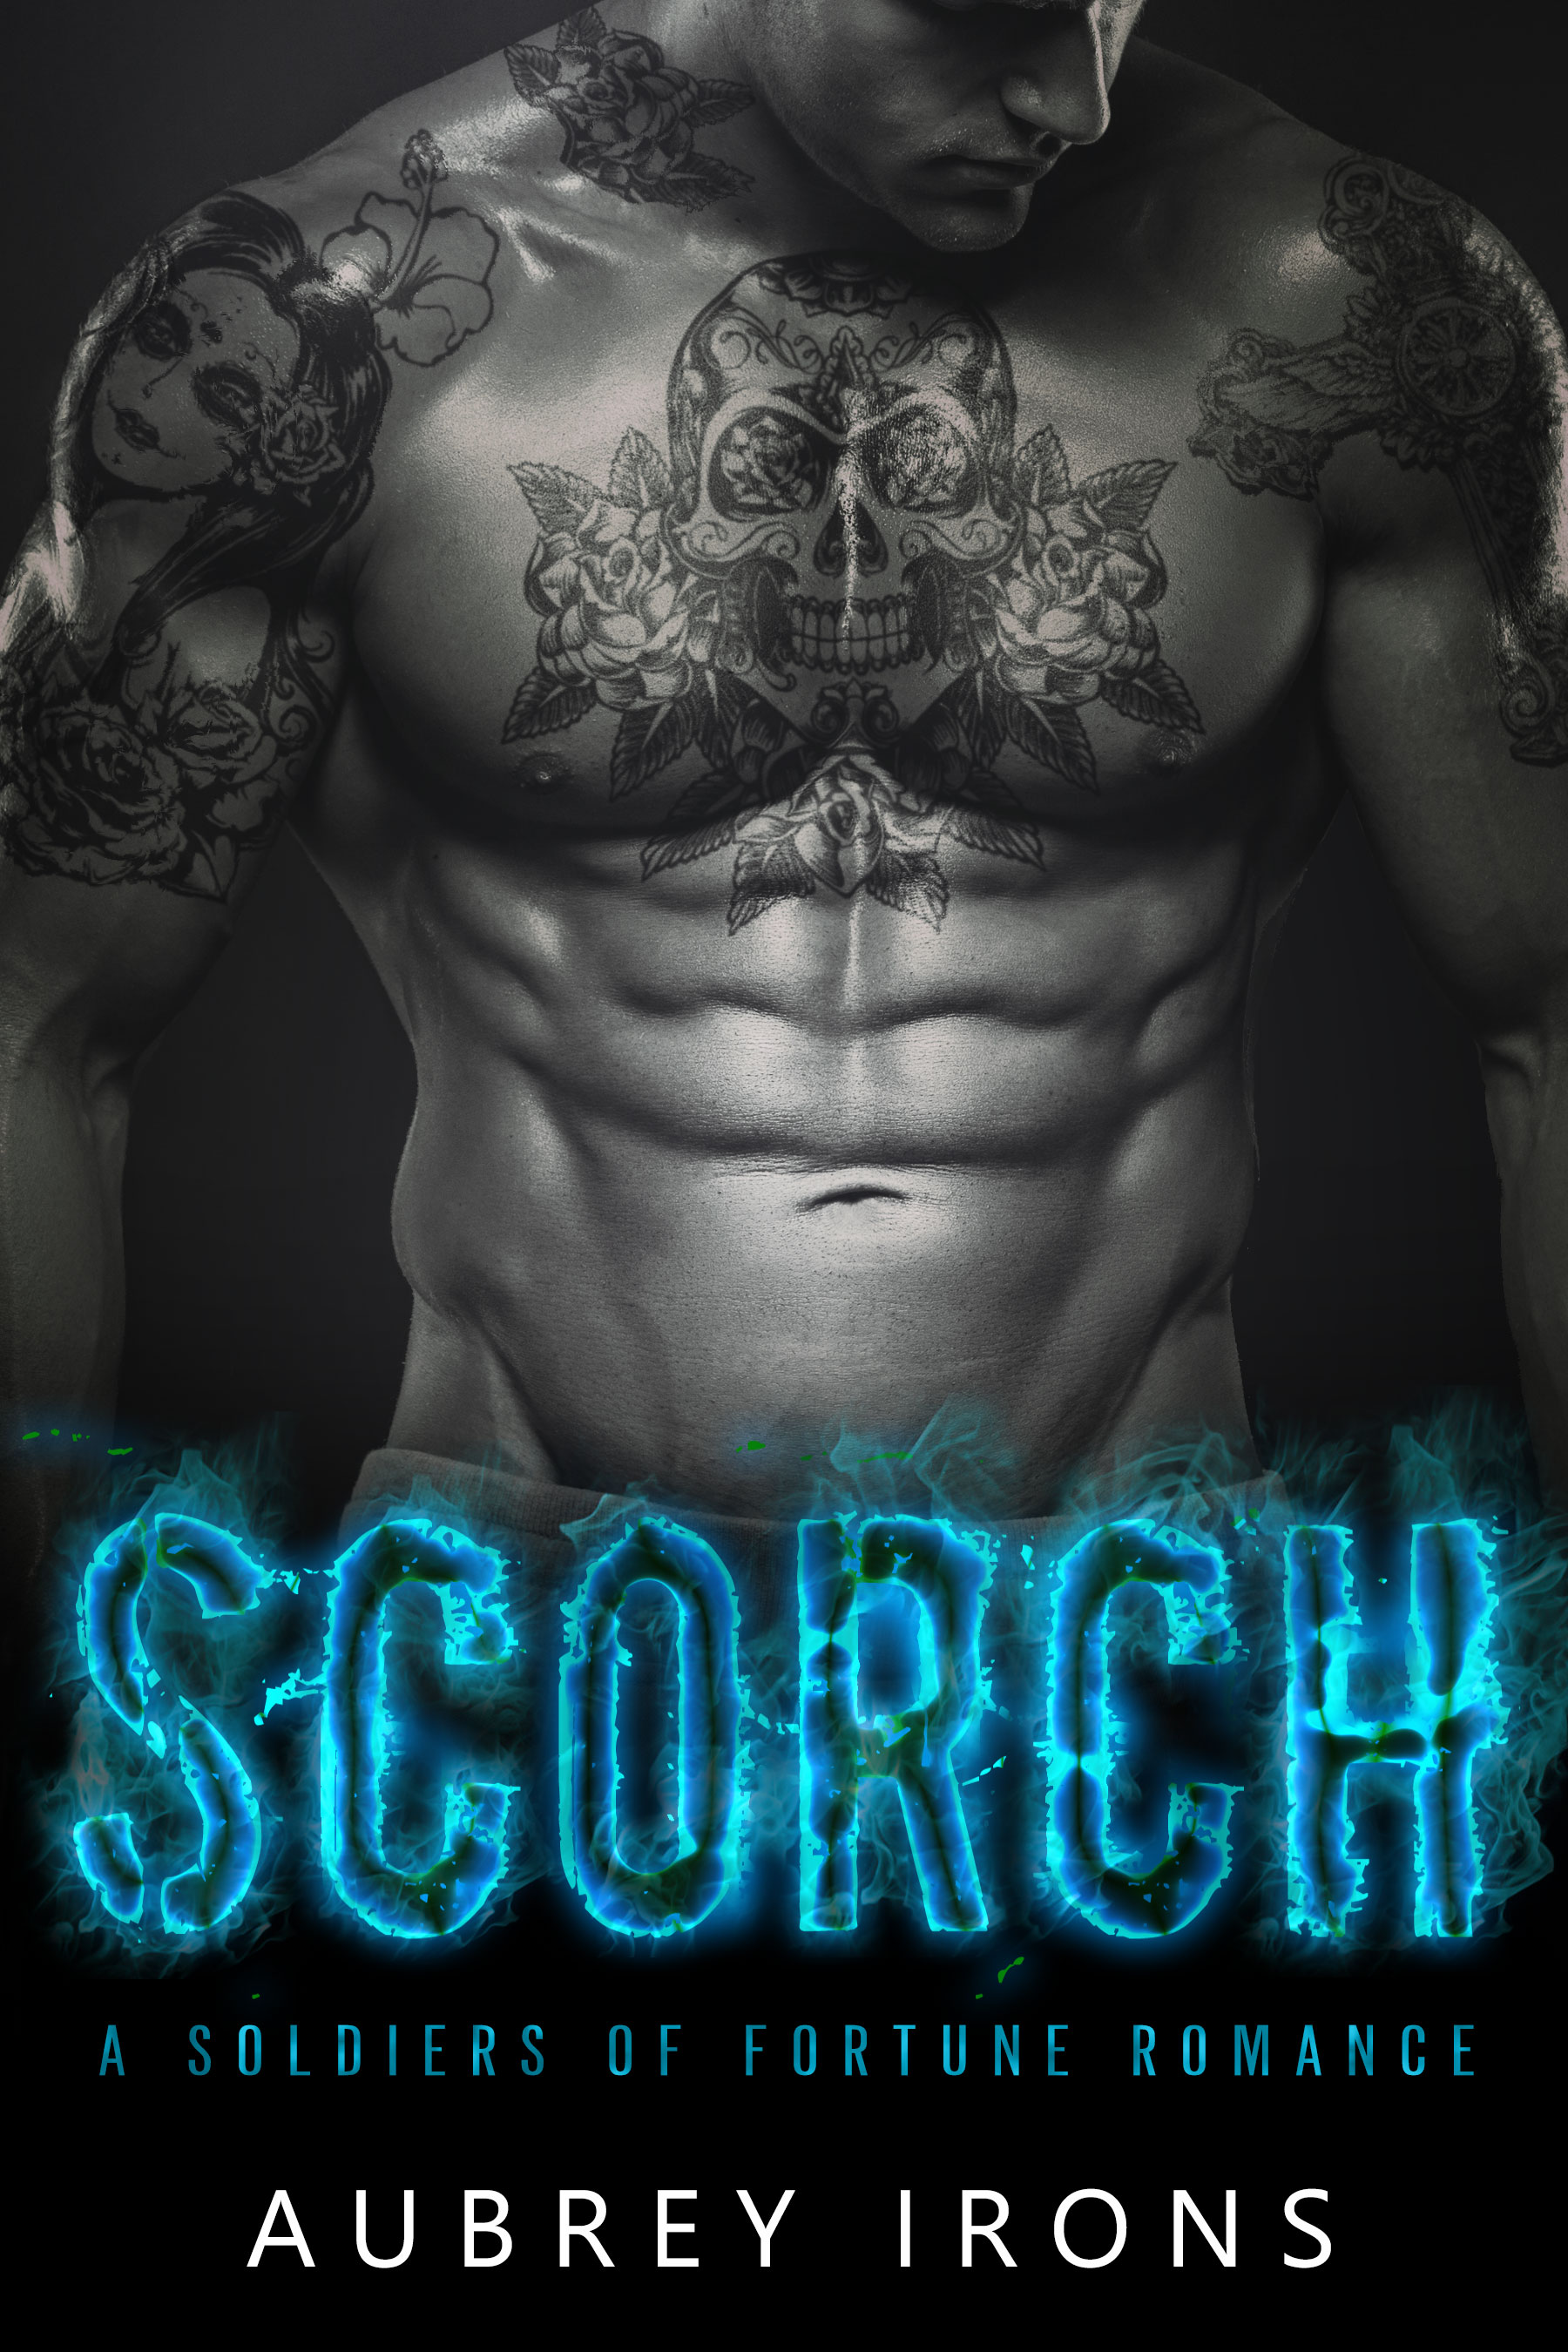 Scorch---New-Cover.jpg